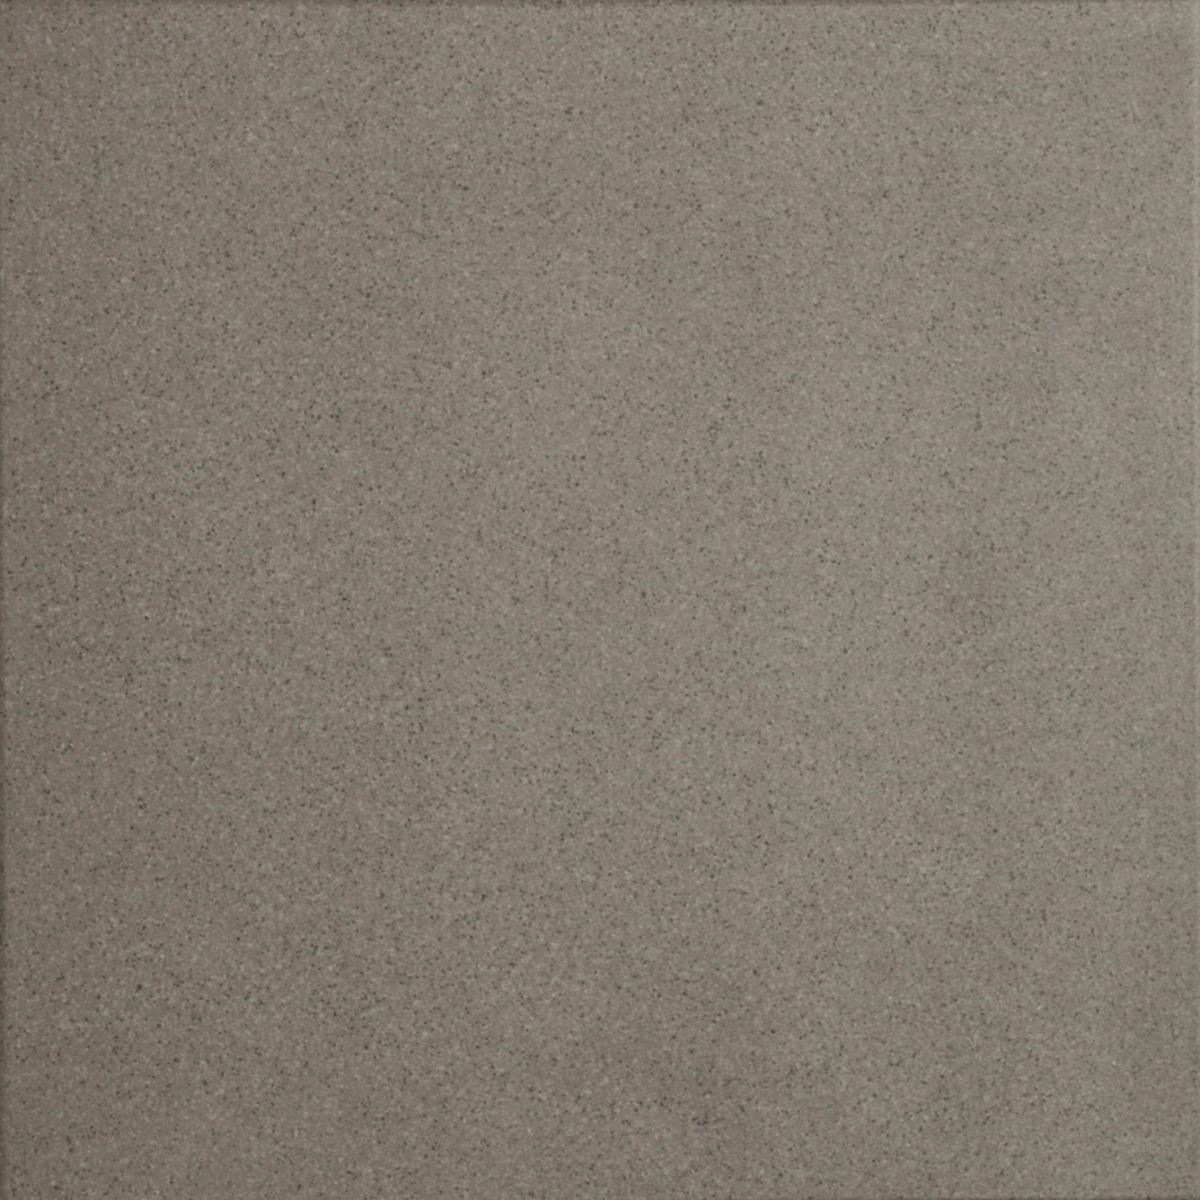 Dlažba Multi Kréta šedá 30x30 cm mat TAA35505.1